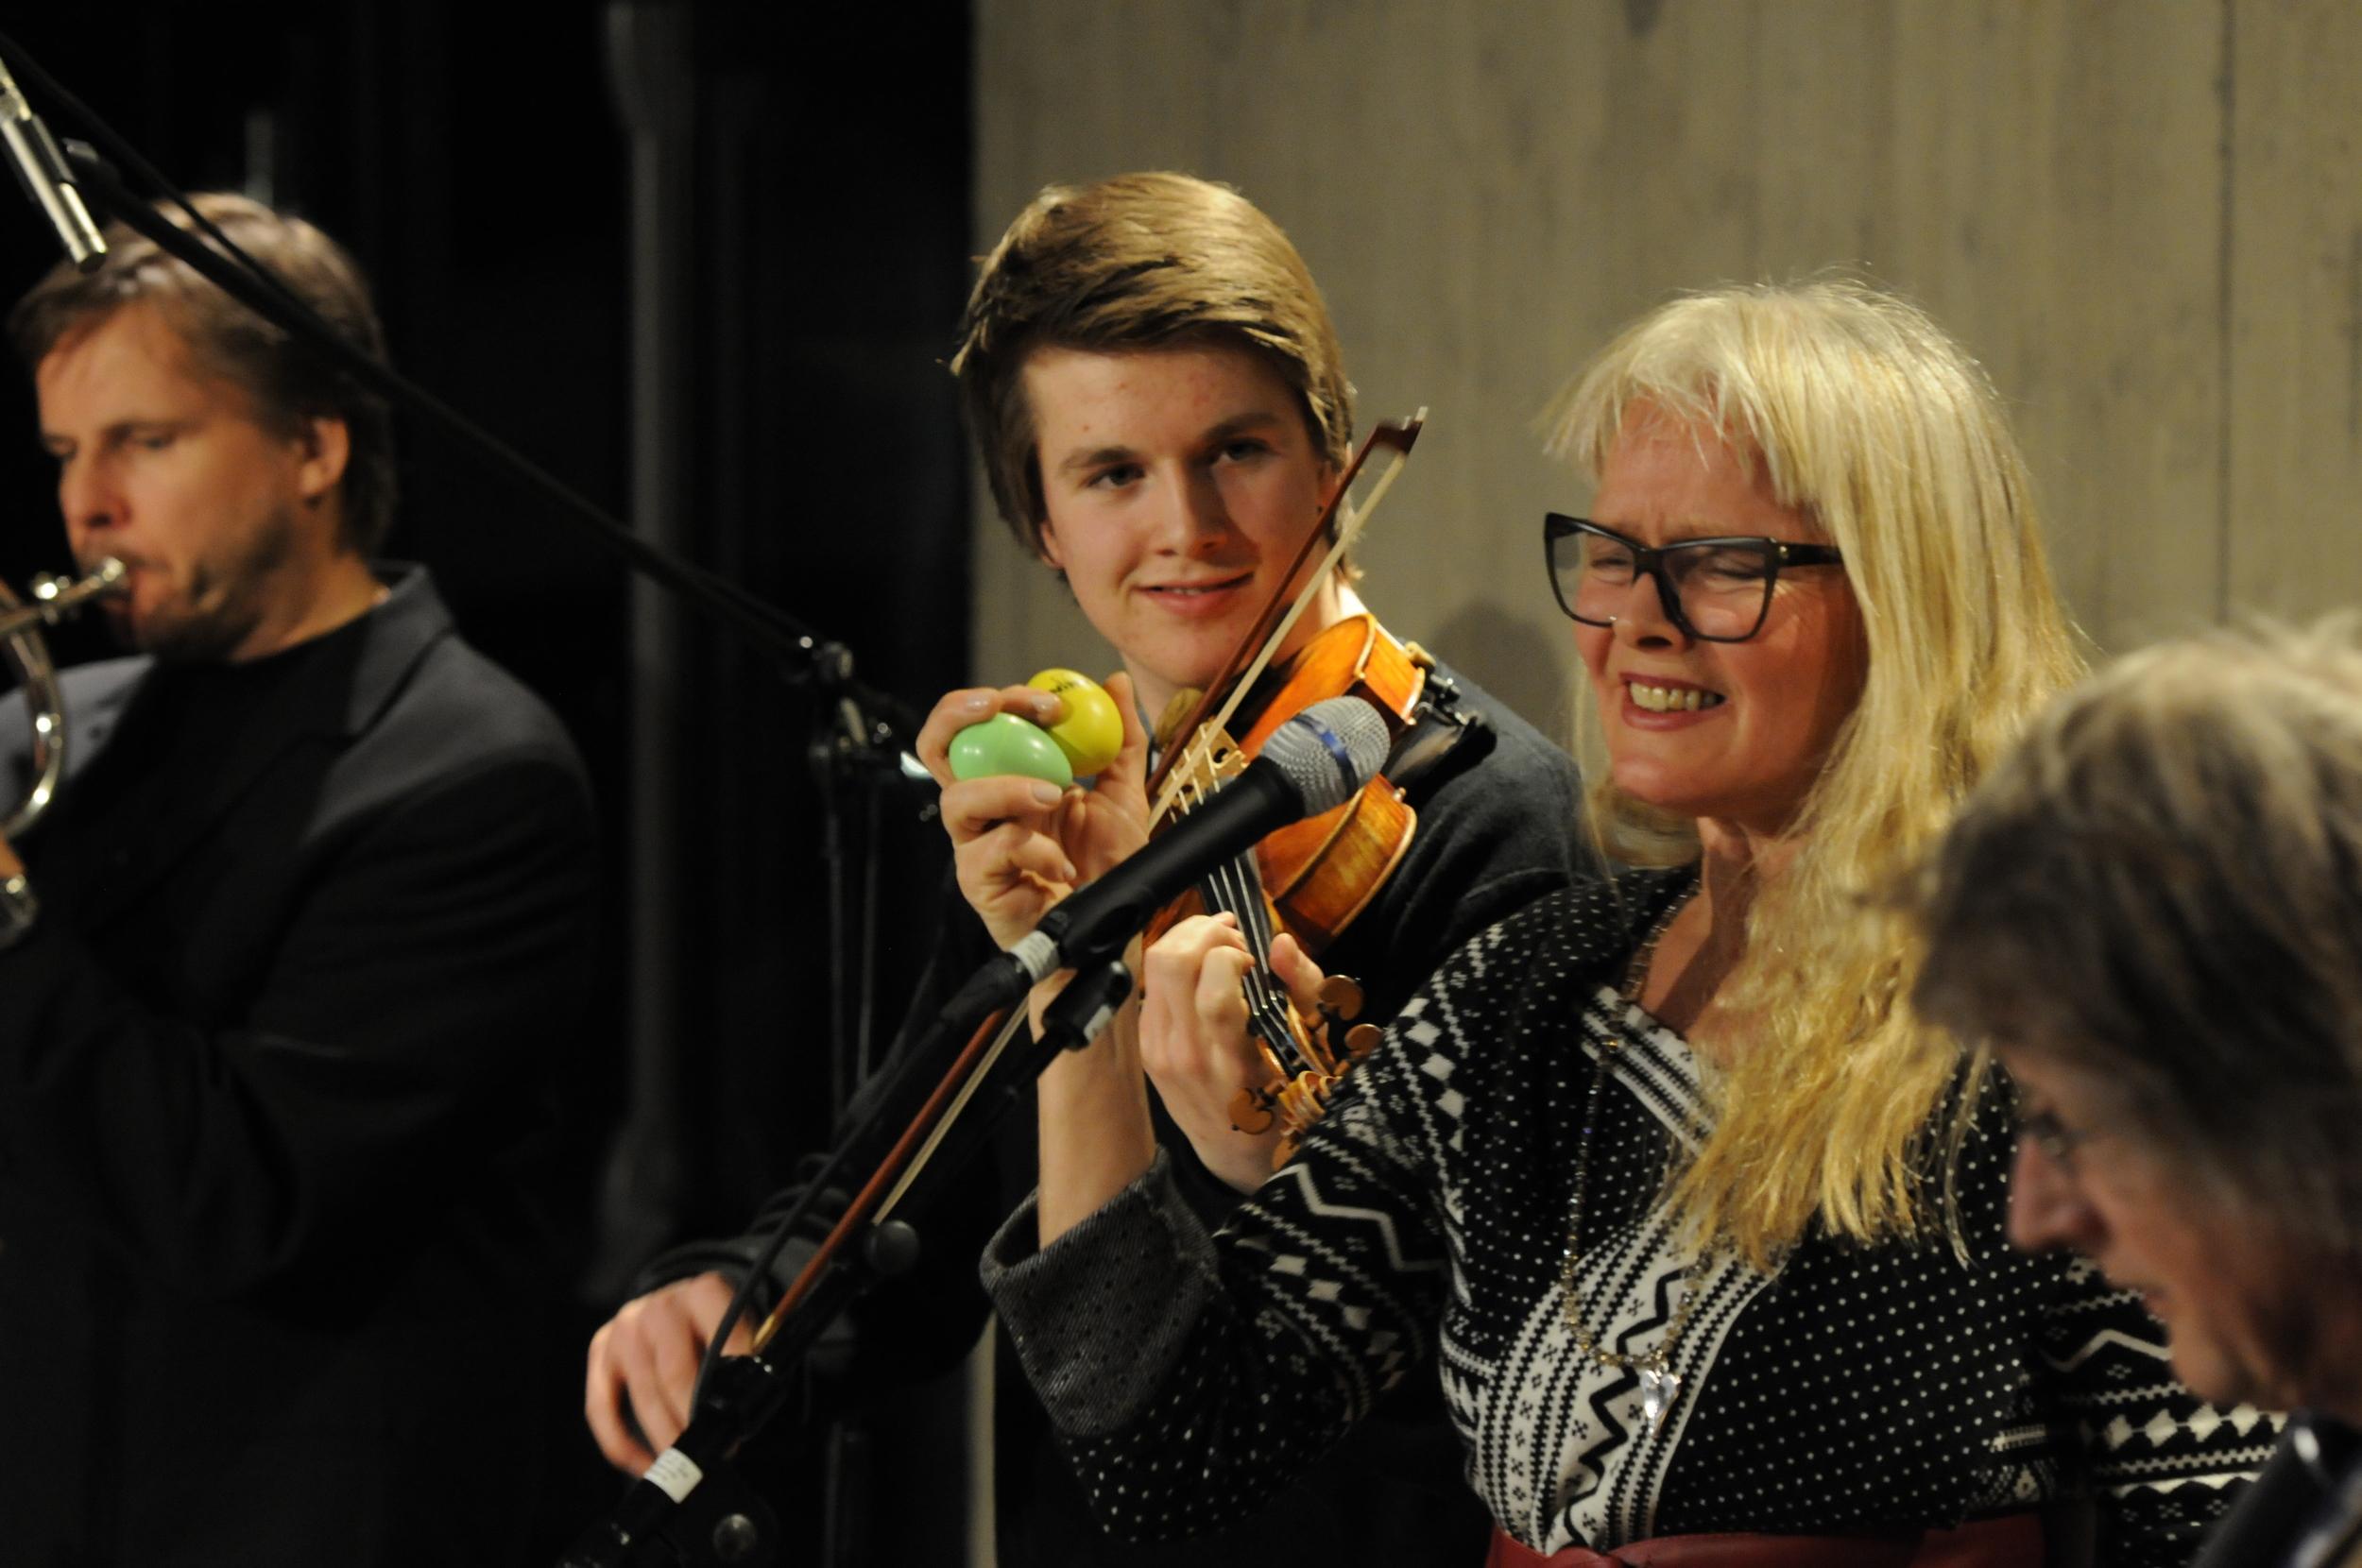 Turné i Oppland med Roy Nikolaisen, Andris Hemsing, Øystein Norvoll og OddmundFinnseth(2012) Foto: Ingvar Skattebu